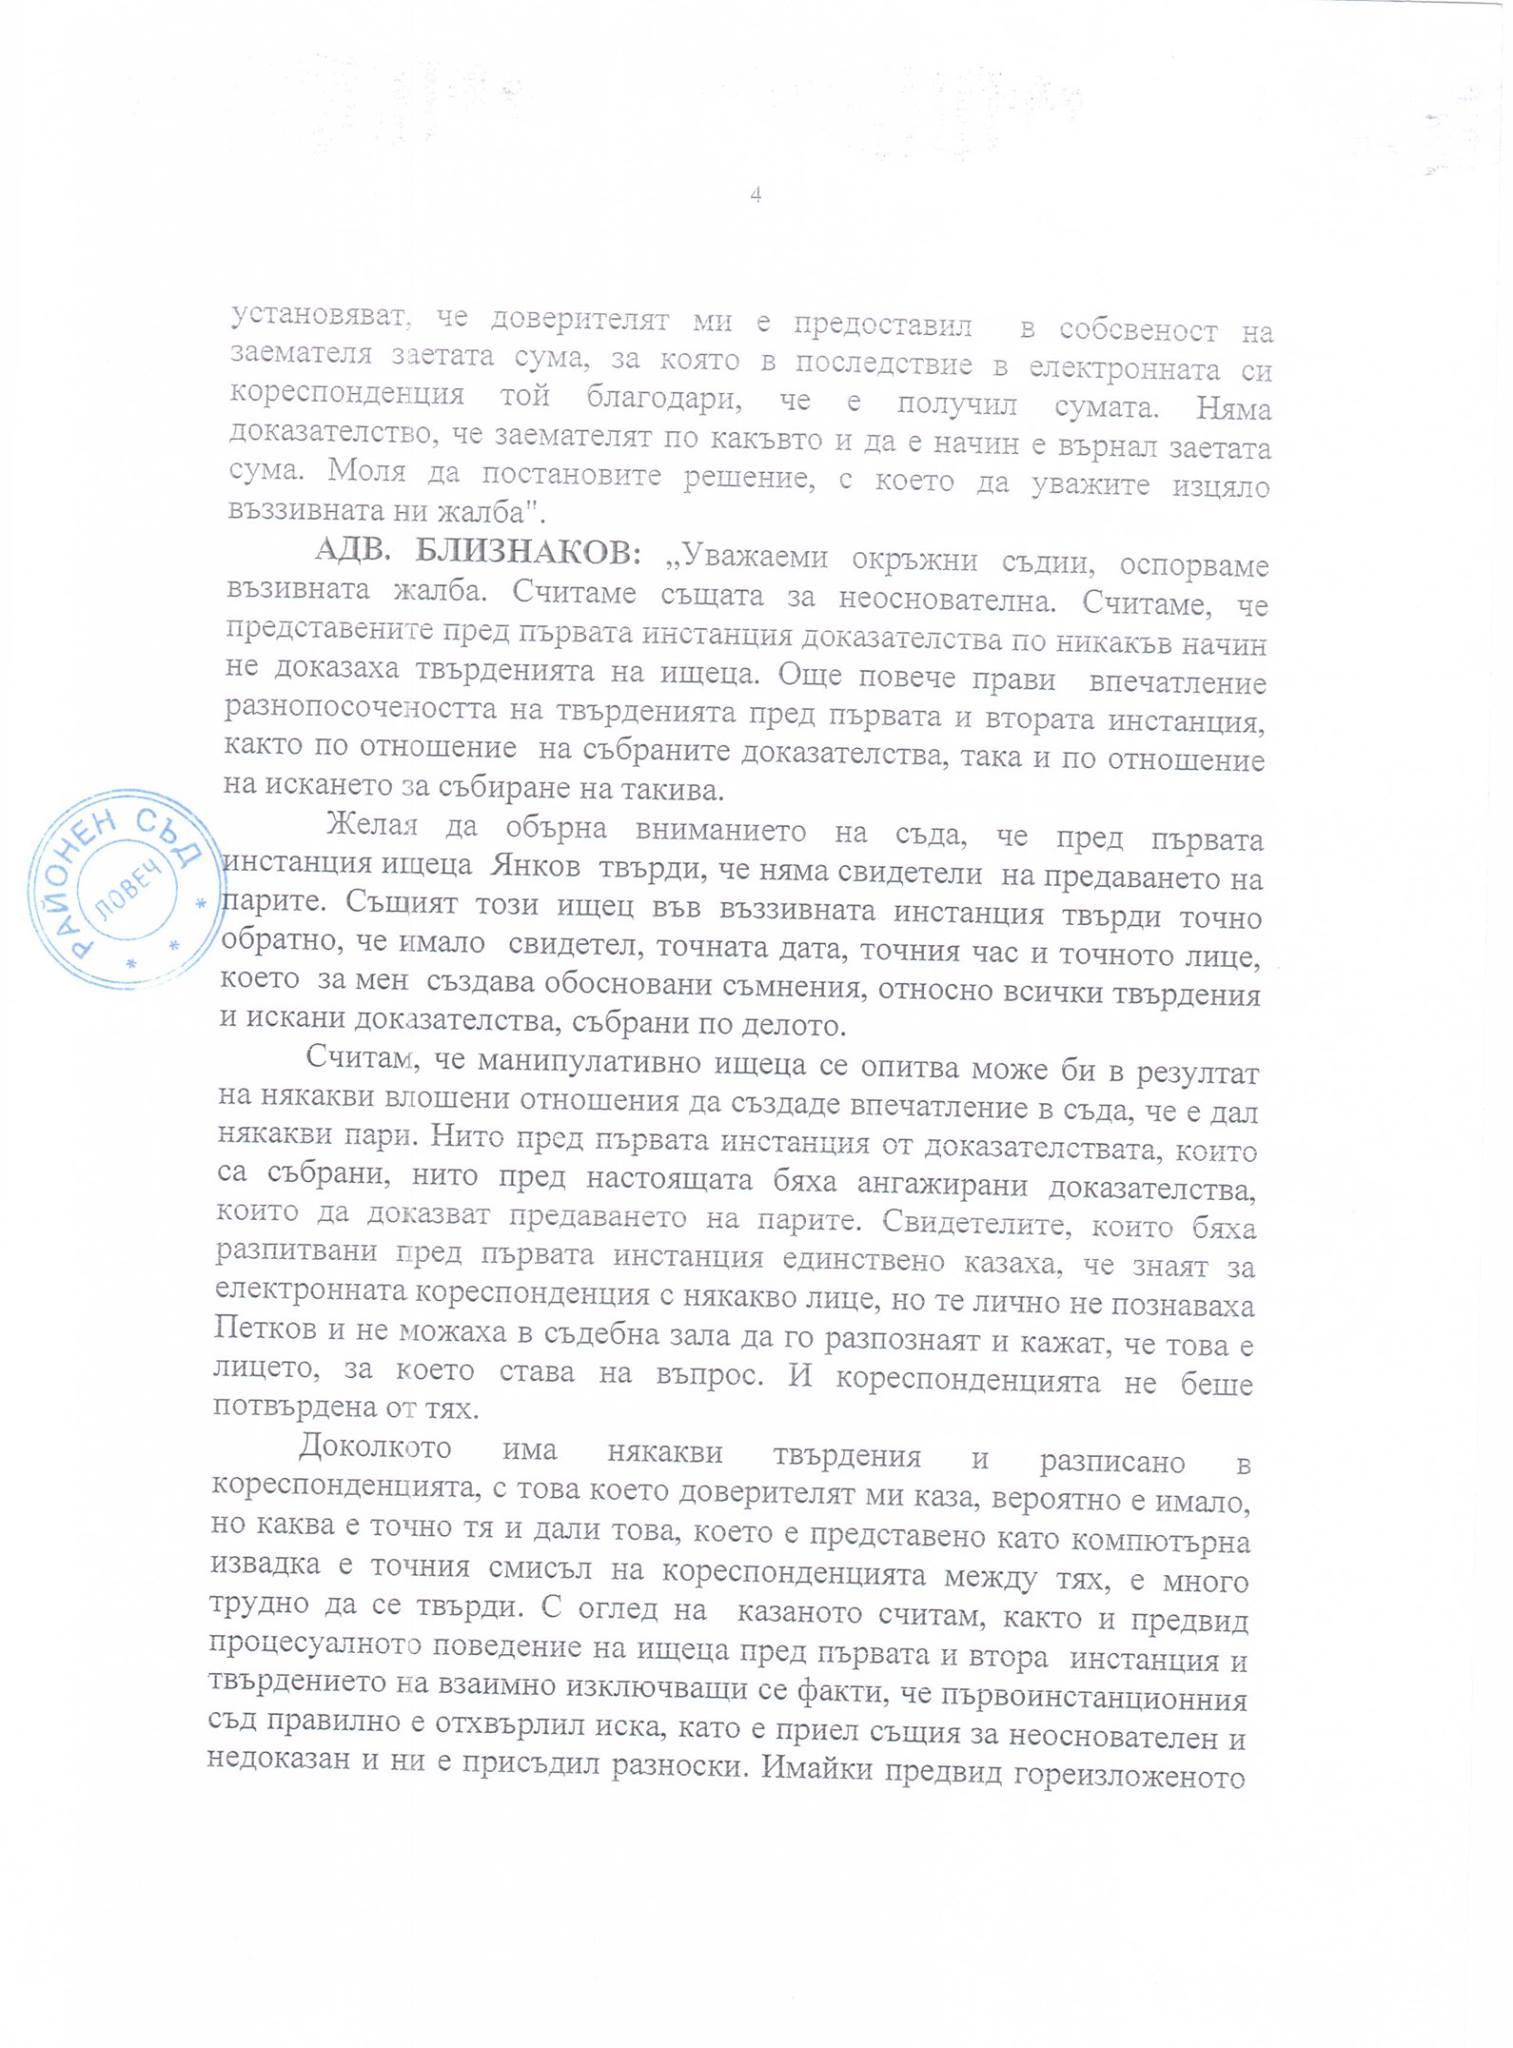 protokol-petkov-4